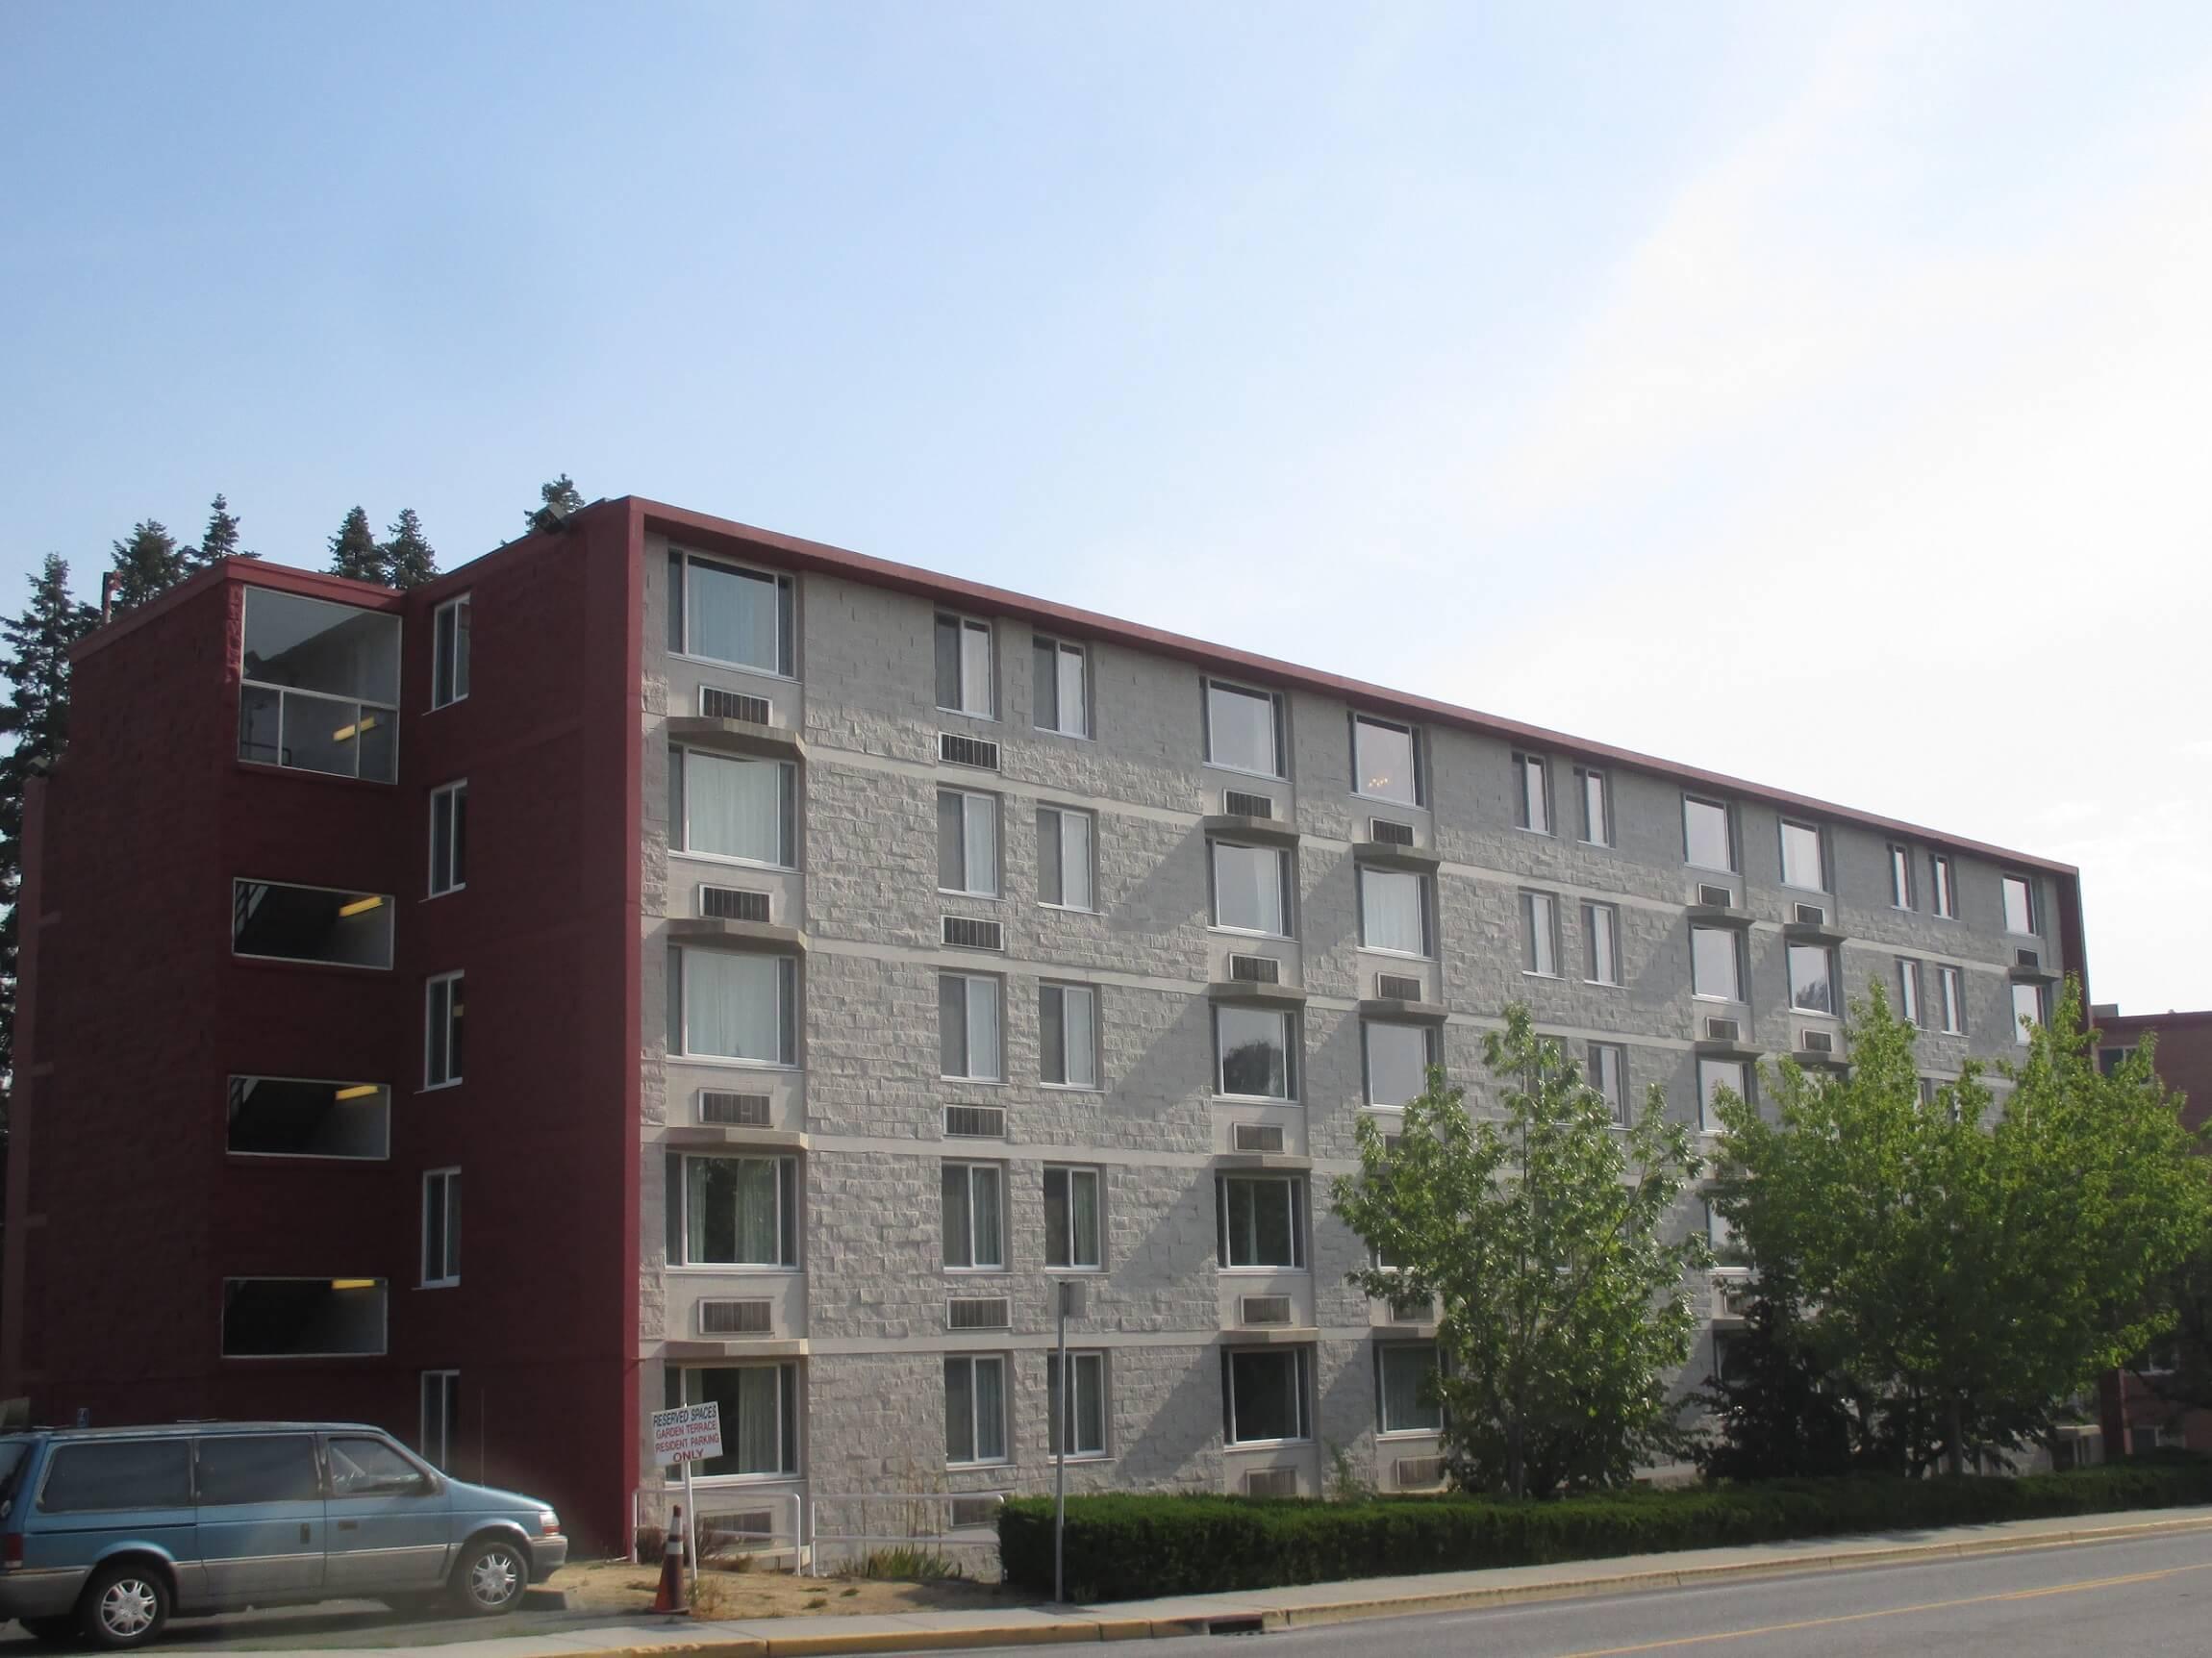 Expand Garden Terrace Apartments building